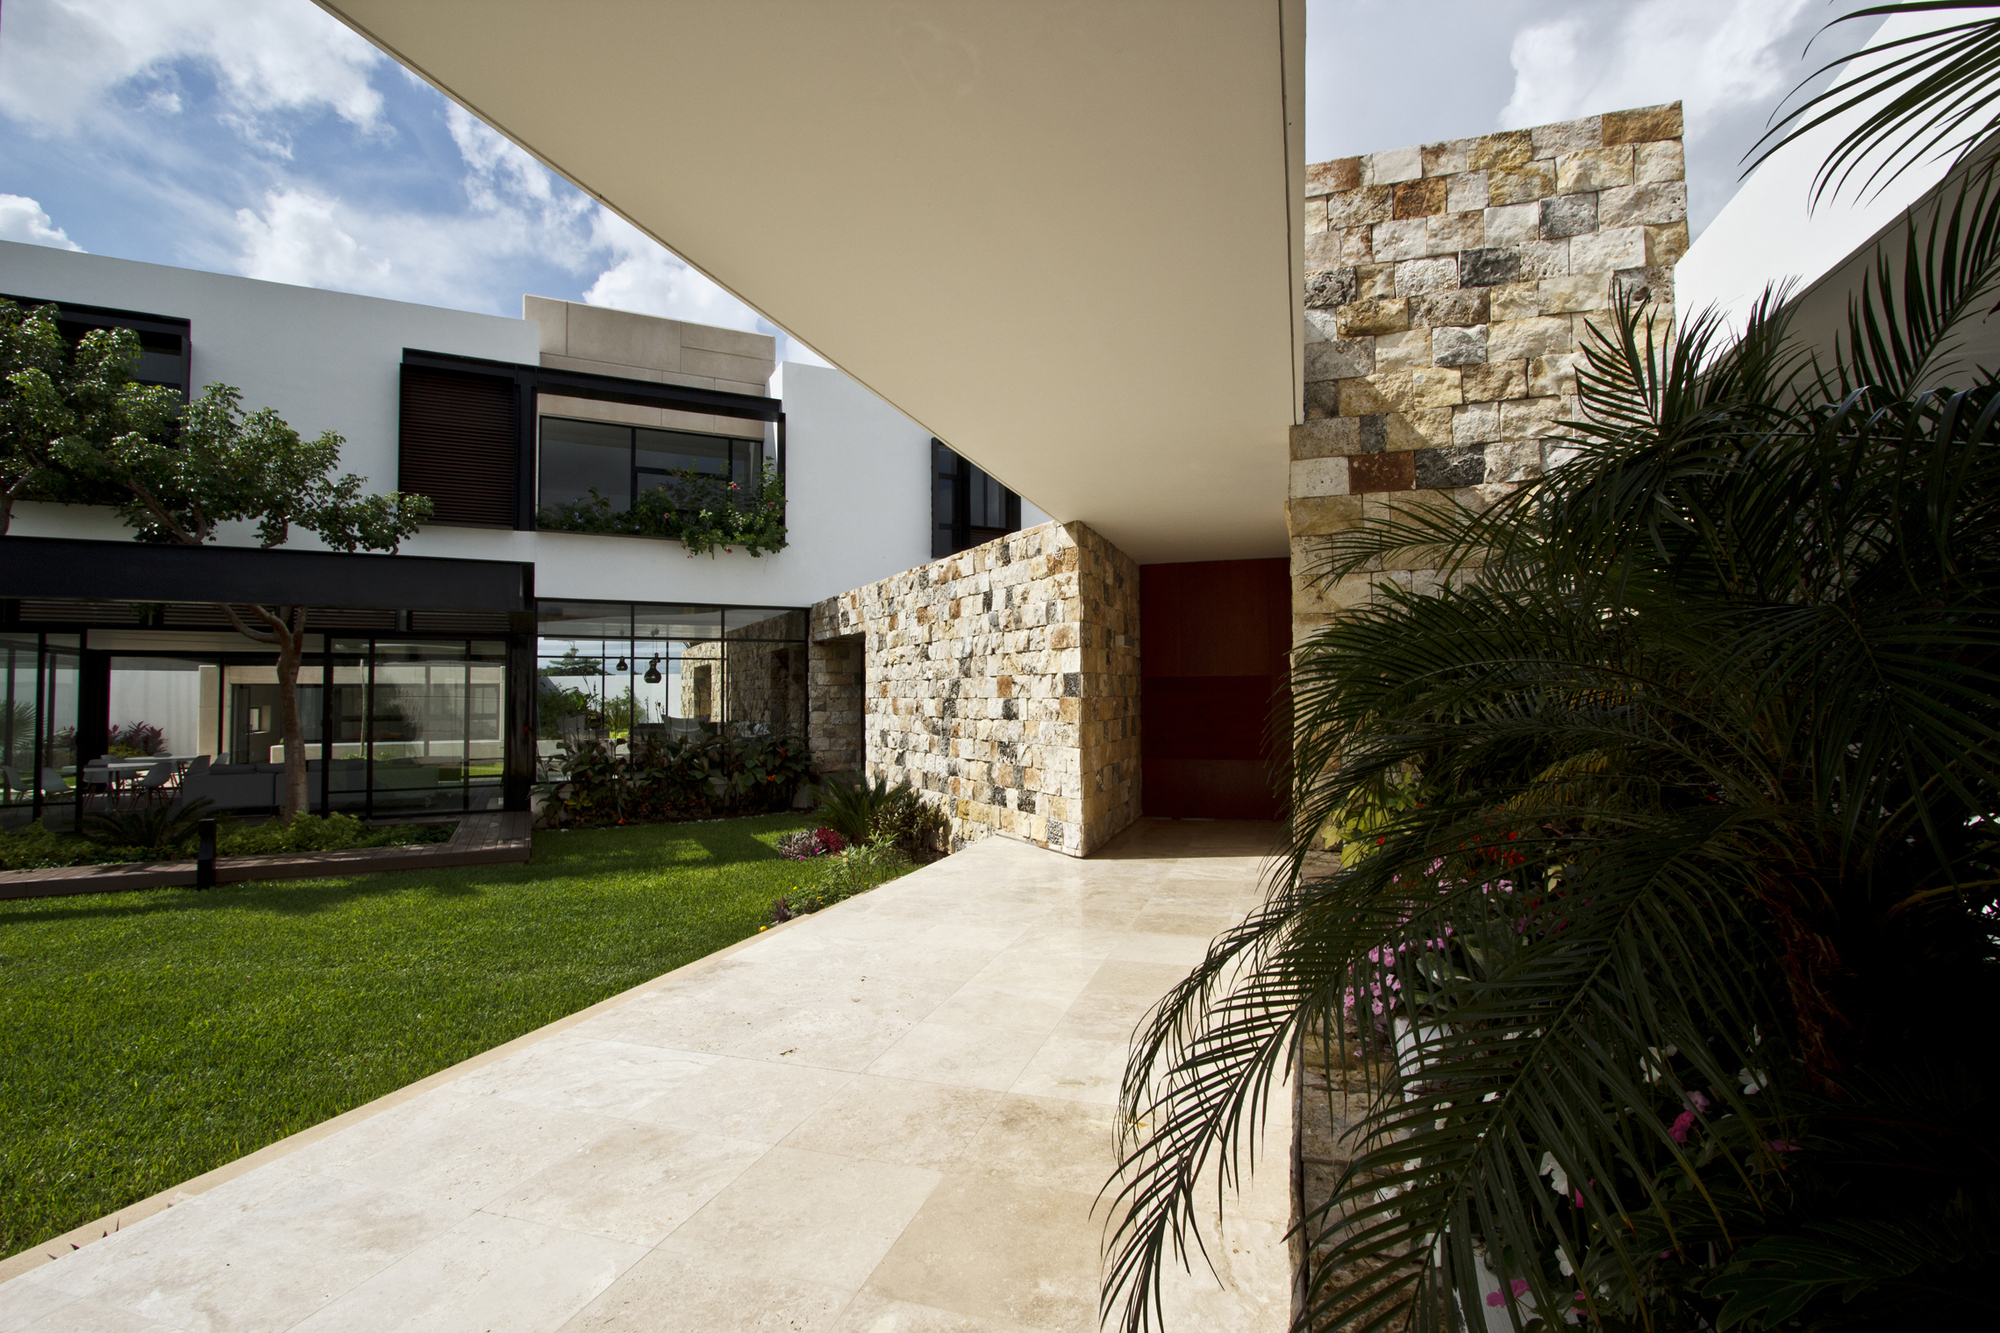 Contemporary-Comfort-At-The-Temozón-House-in-Yucatan-Mexico-19